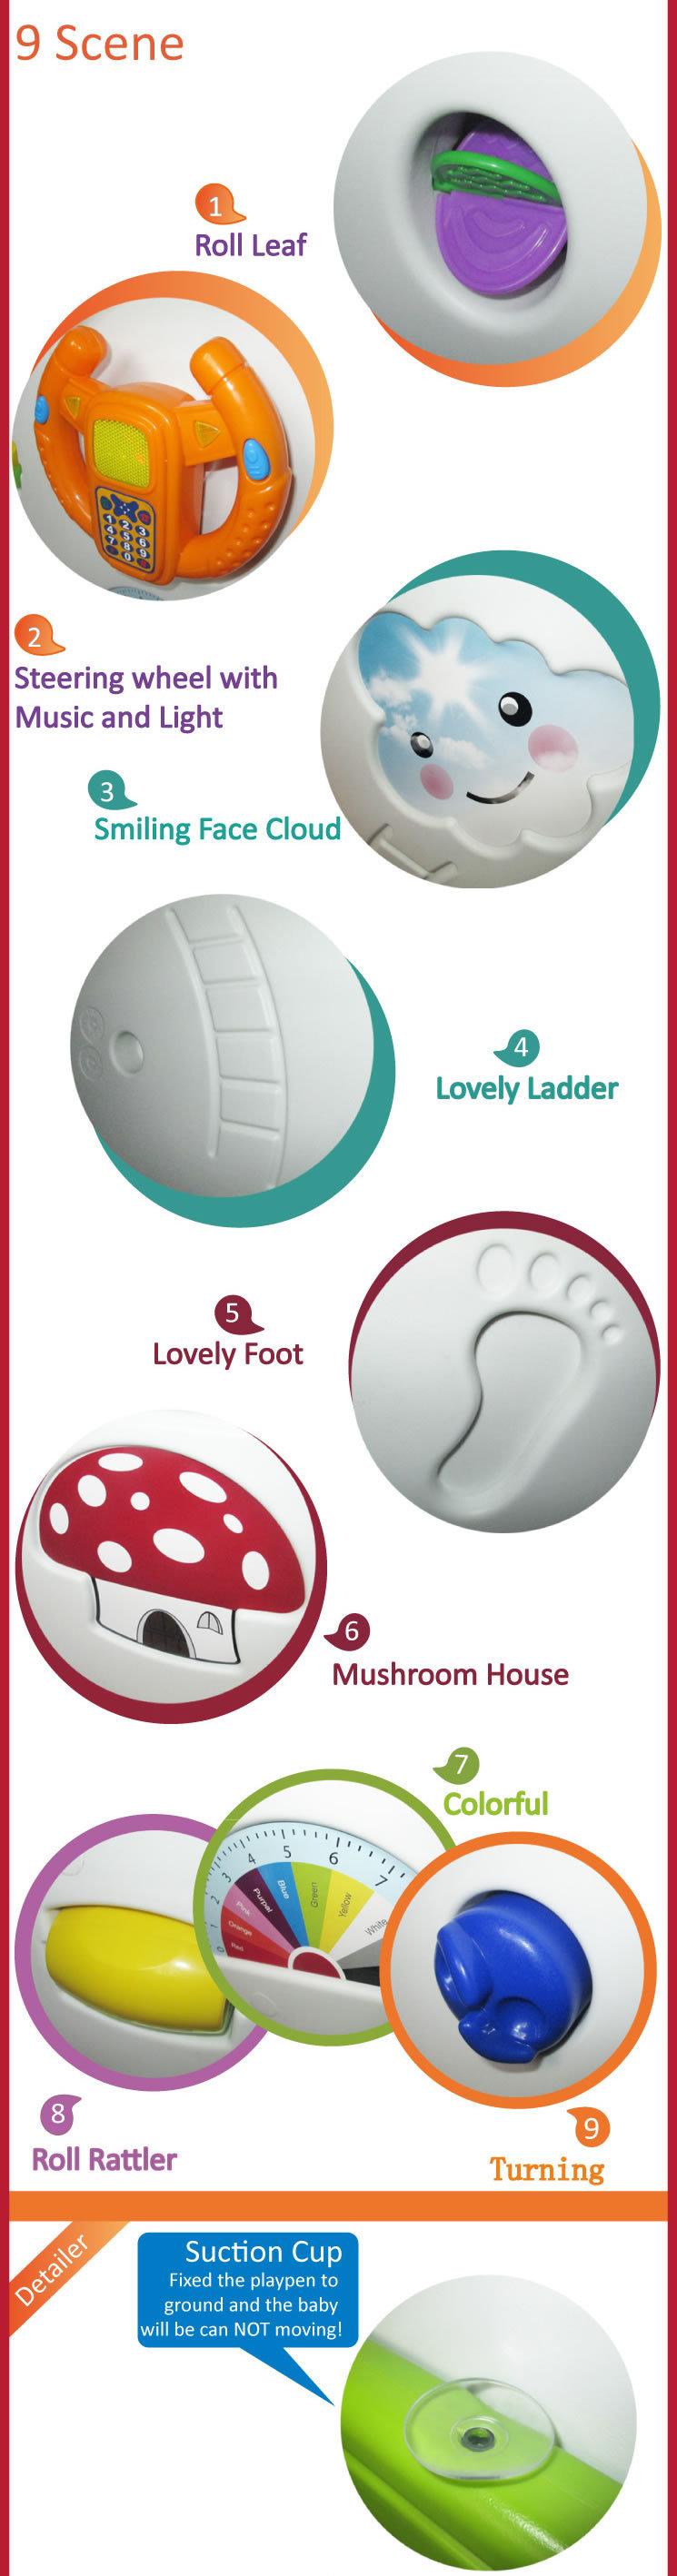 2020 New Design Saftey Game Playpen Kids Plastic Playpen Fence luxury baby playpen